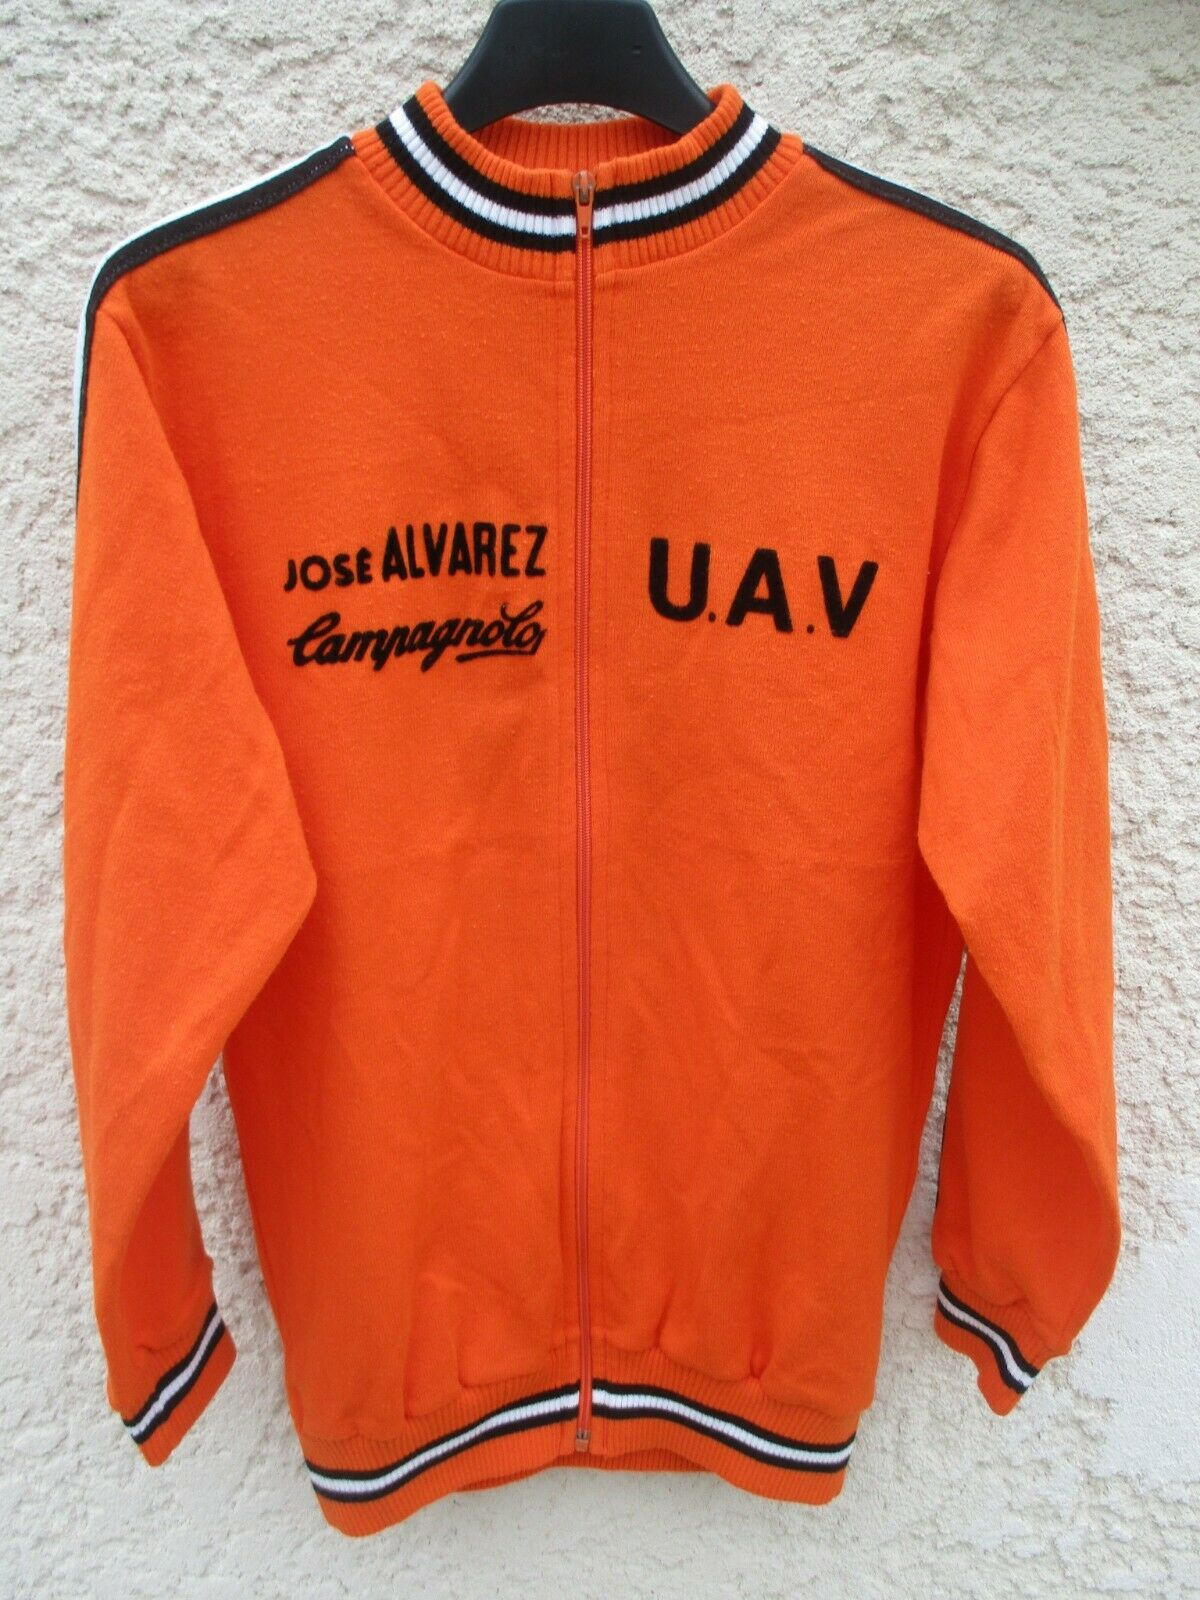 Veste cycliste José ALVAREZ CAMPAGNOLO vintage Vic-Fezensac jacket jacke giacca